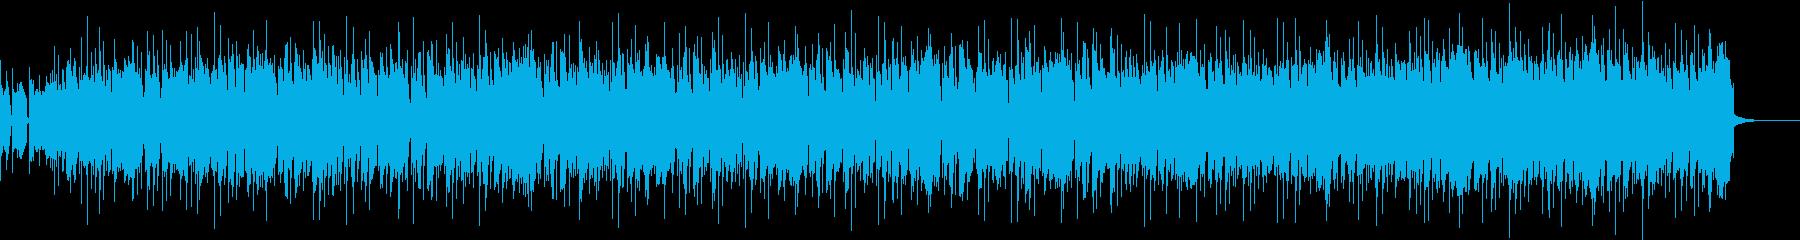 BassとGtのRockなセッション風の再生済みの波形